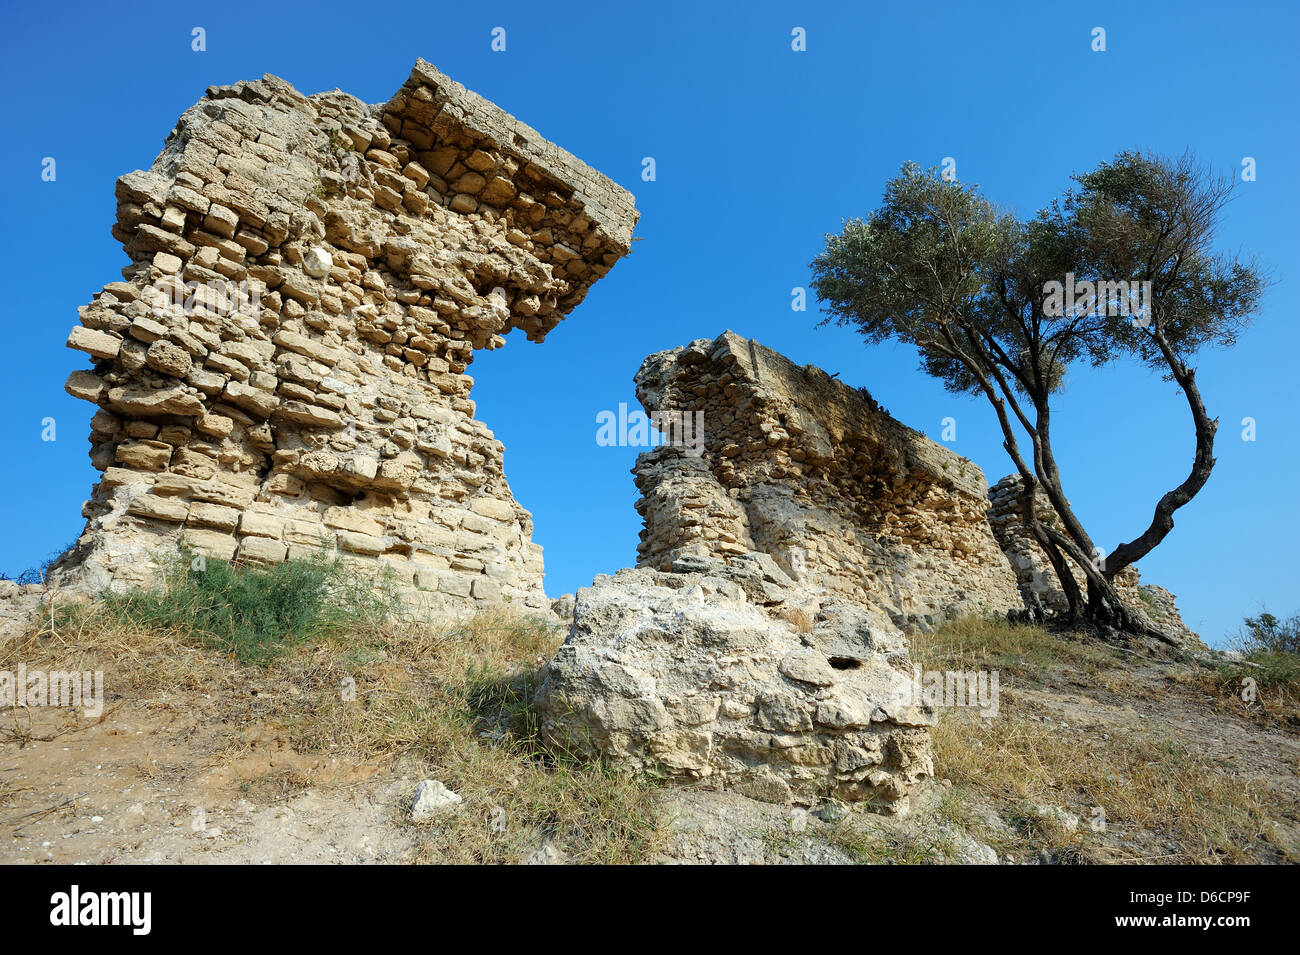 Remains of ancient walls - Stock Image